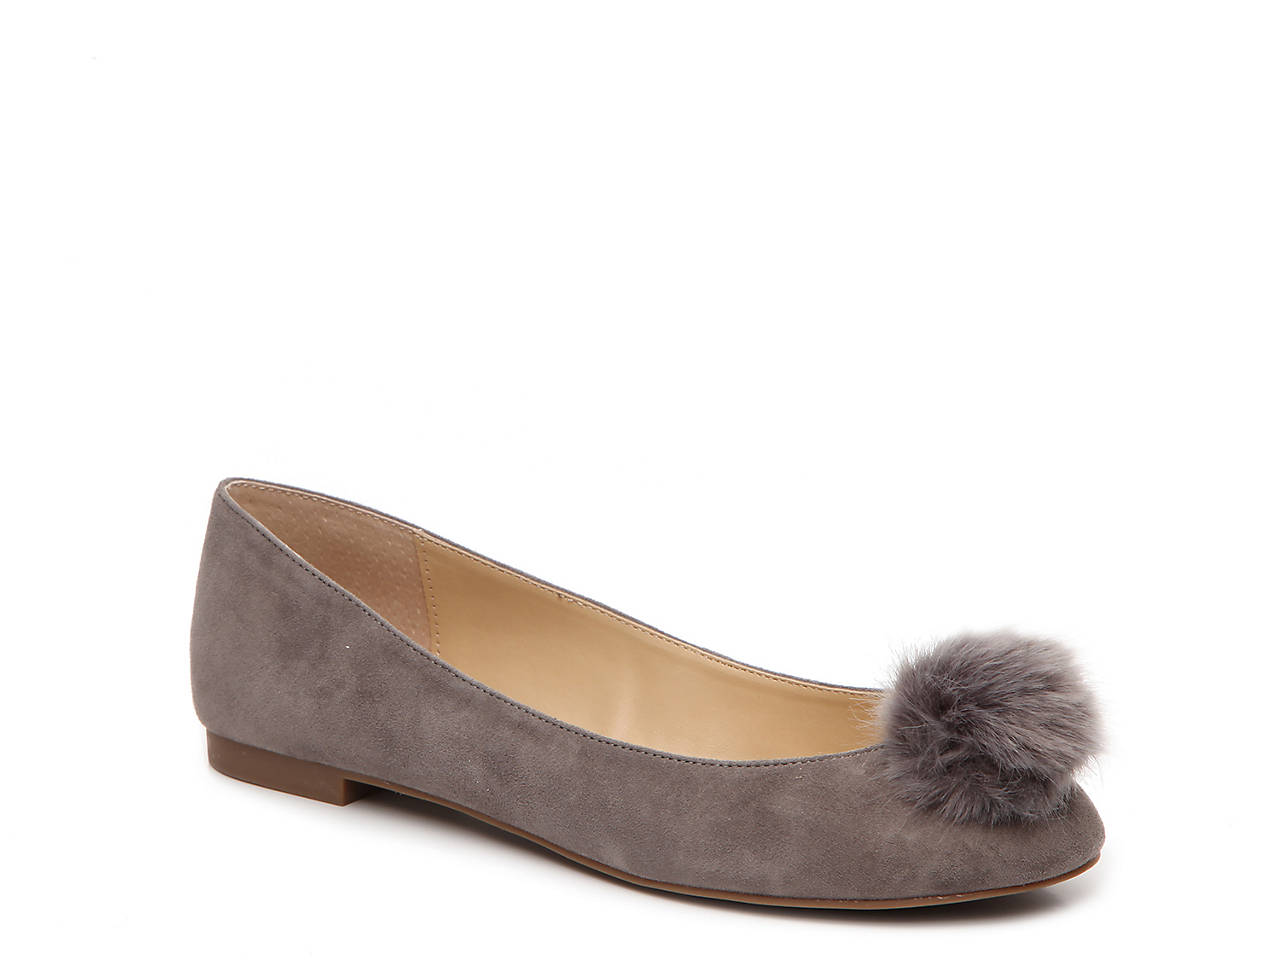 a3871561ca4a Charles David Dani Ballet Flat Women s Shoes